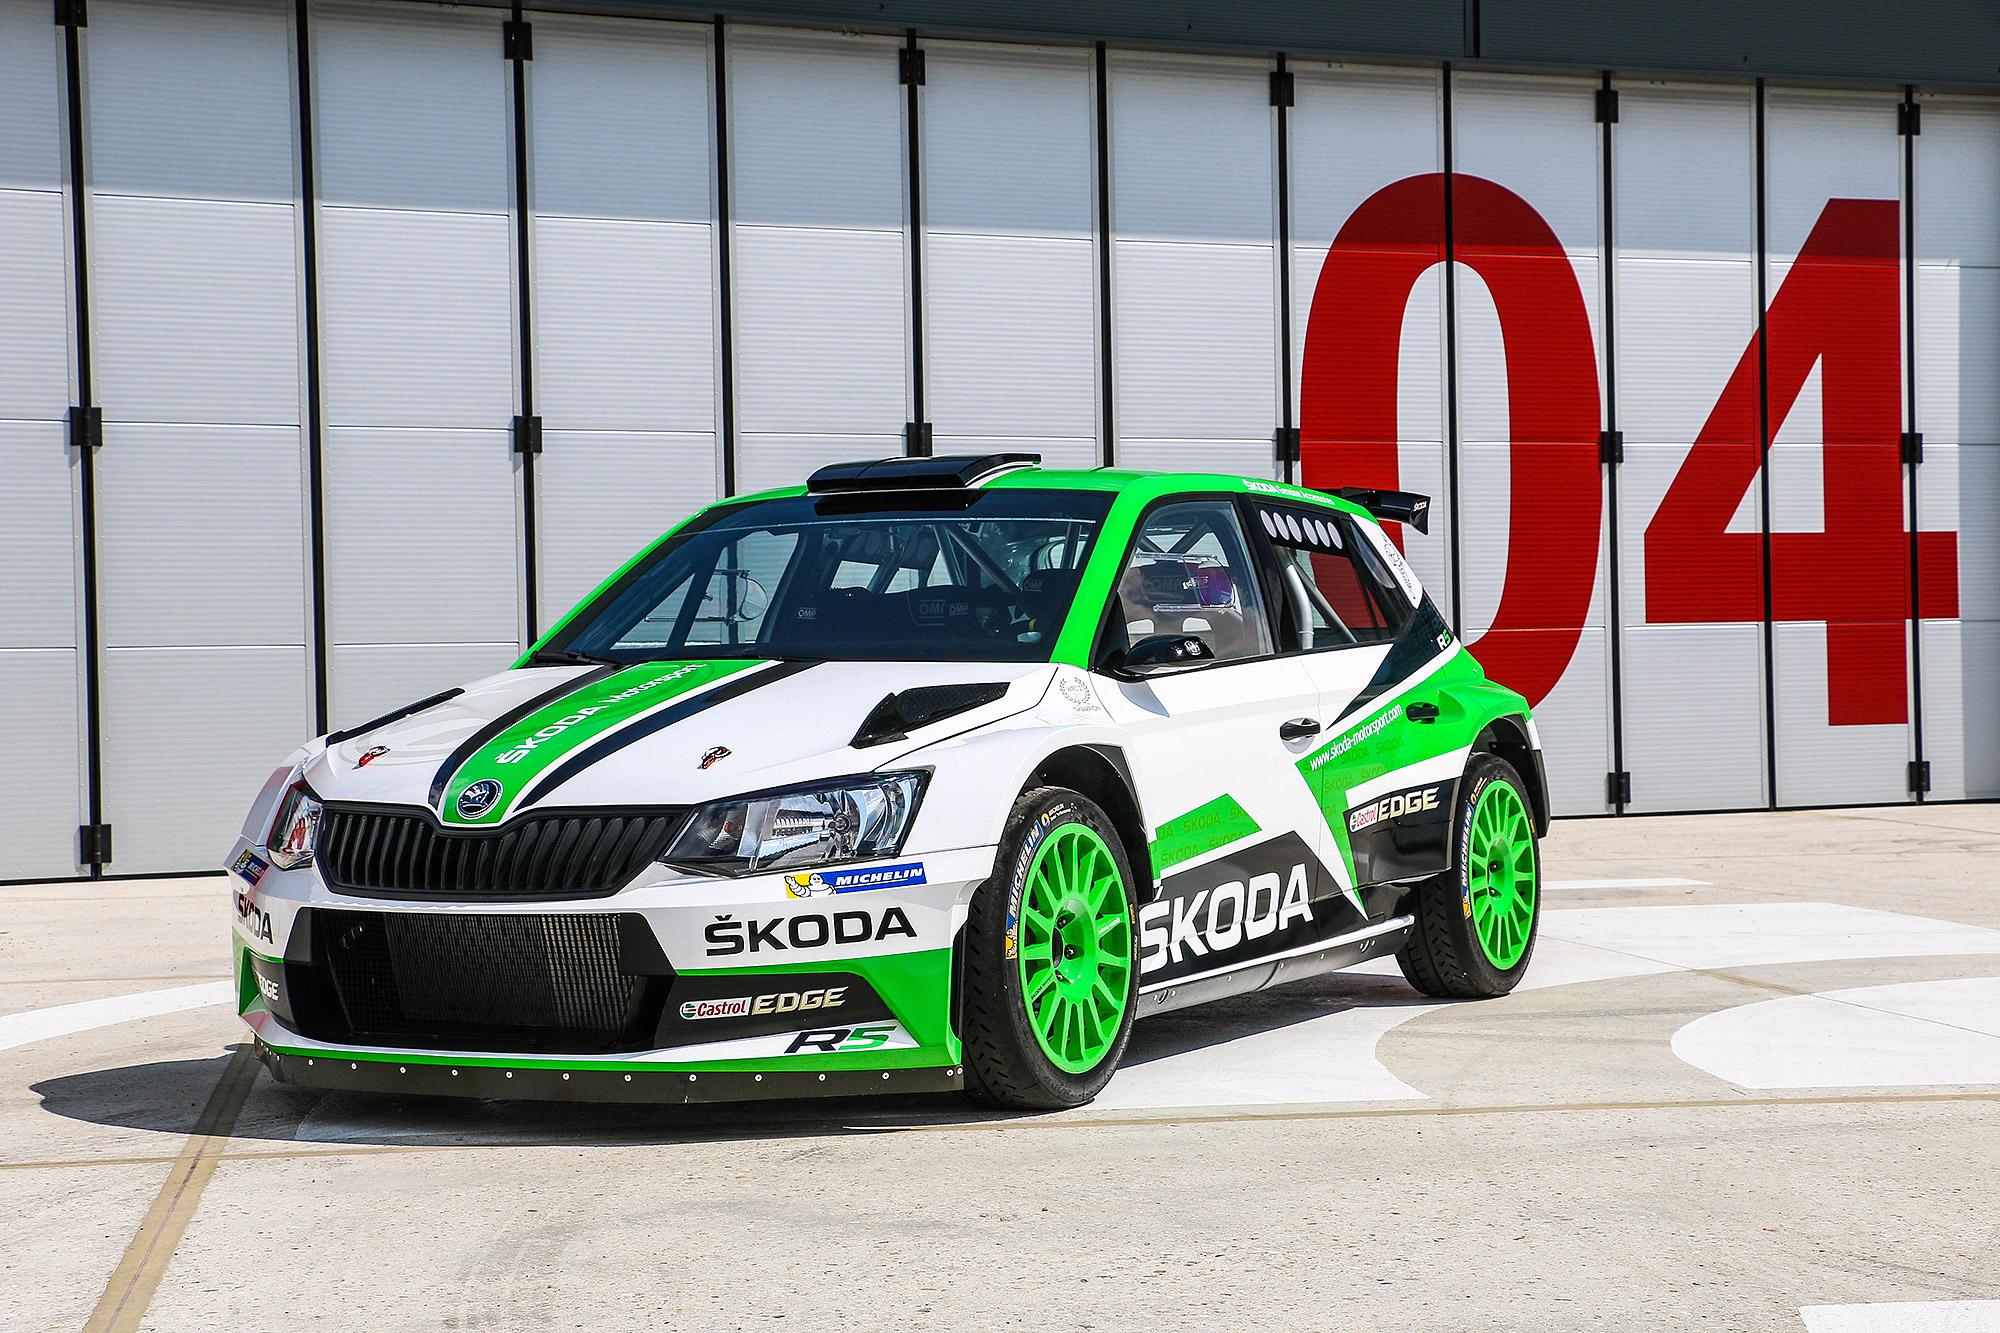 WRC-2 冠軍賽車 Fabia R5 將登台演出。